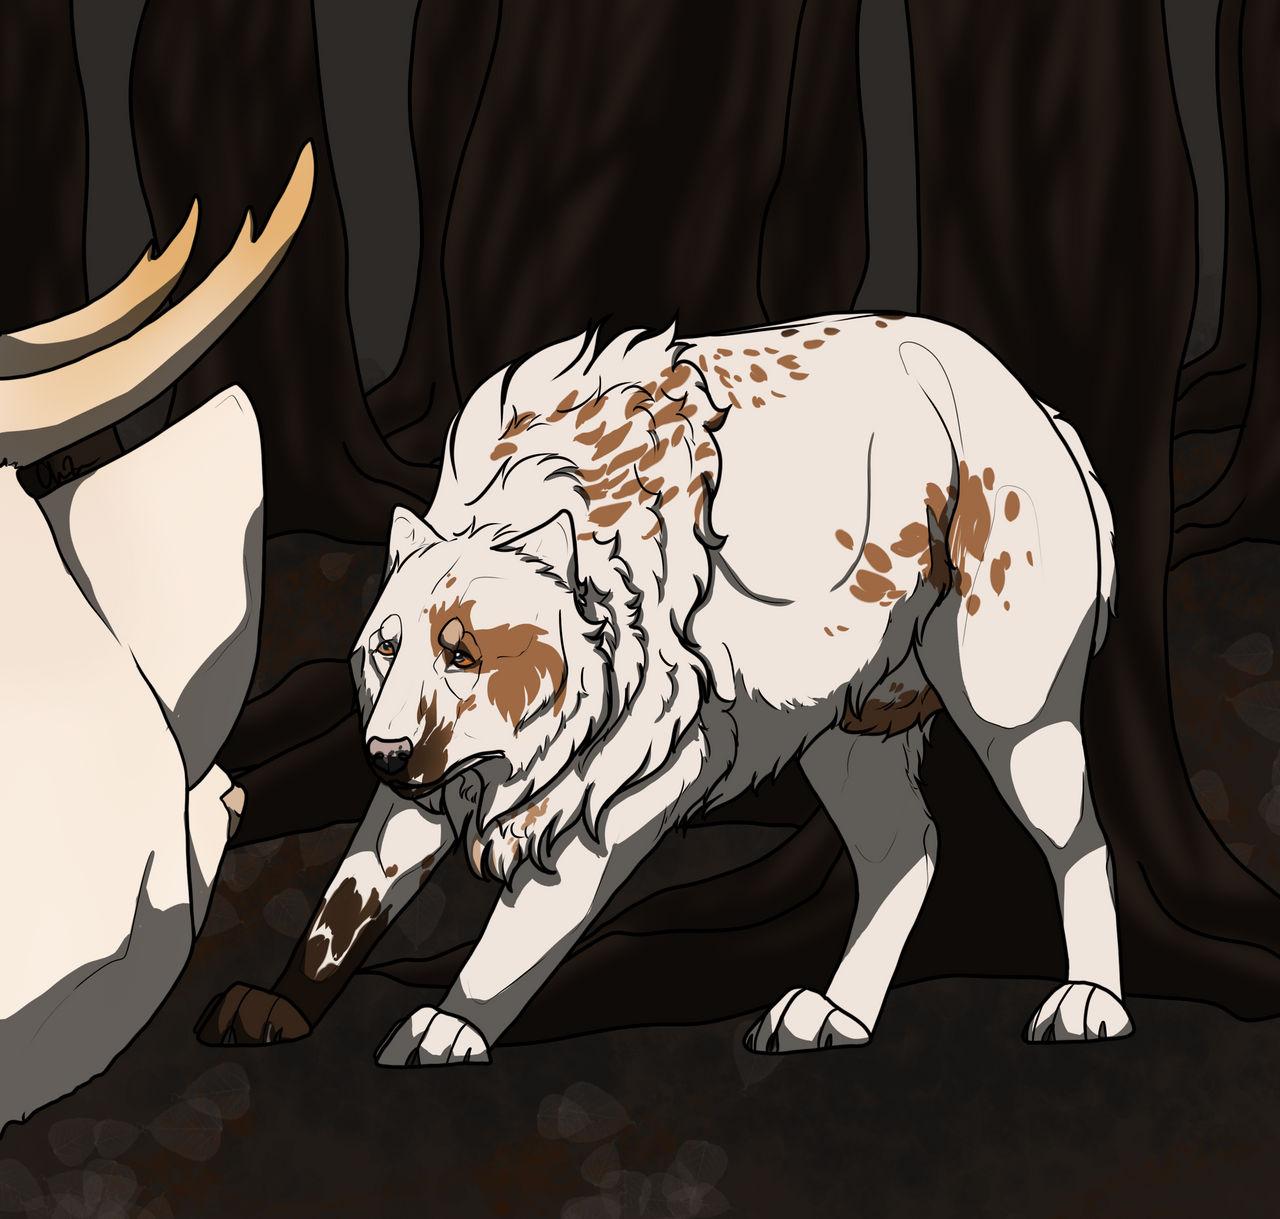 [RoD] animeartist62 by Losas